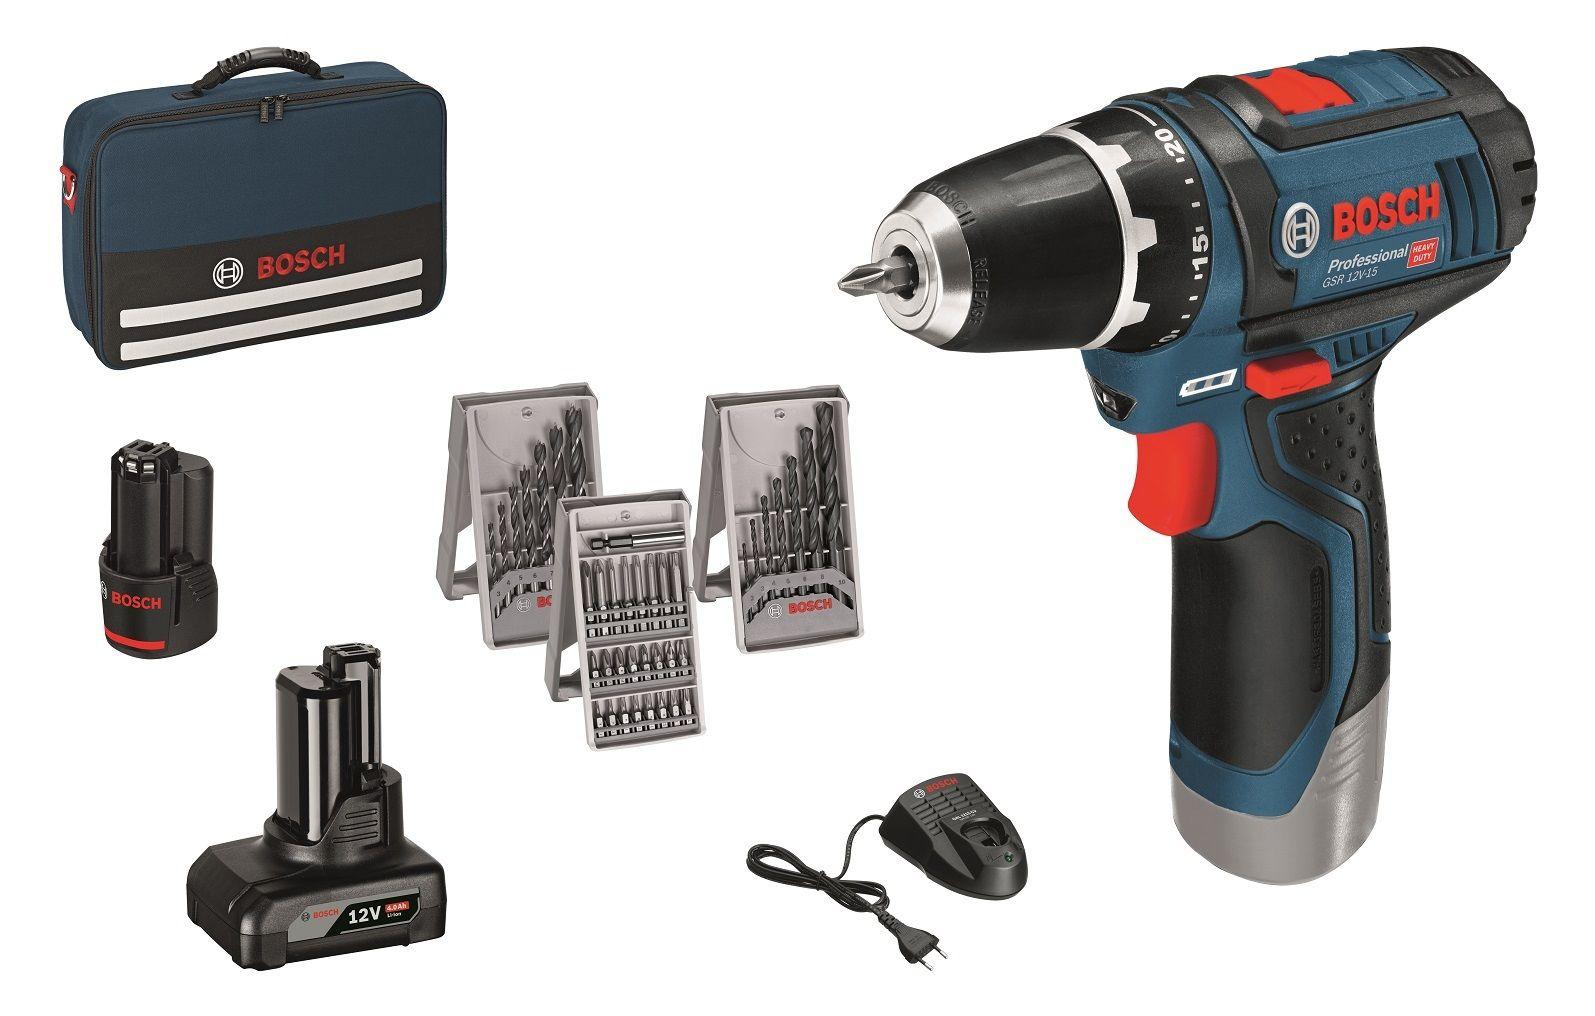 [eBay] BOSCH Akku-Bohrschrauber GSR 12V-15 /  10.8V-2-LI Professional mit 1 x 2,0 Ah & 1 x 4,0 Ah Akku ODER  2x 2,0 Ah & 1x4.0 Ah + 38-tlg. Zubehör-Set in Handwerkertasche (Metall-/Holzbohrer-Set, Schnellladegerät, Bit-Set)